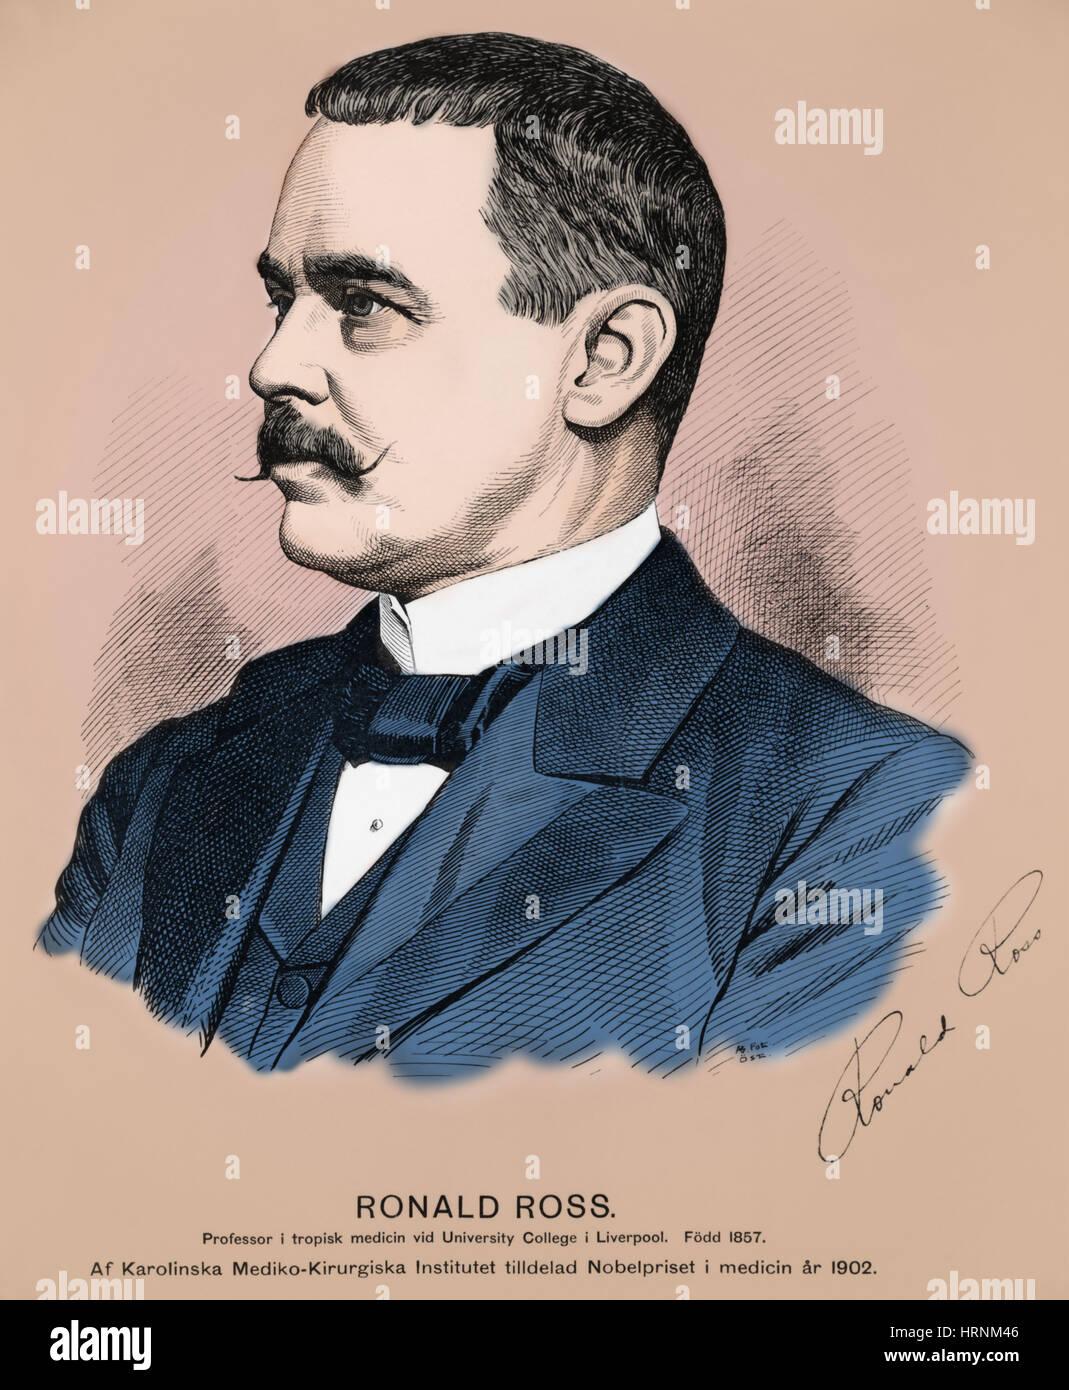 Ronald Ross, British Physician - Stock Image